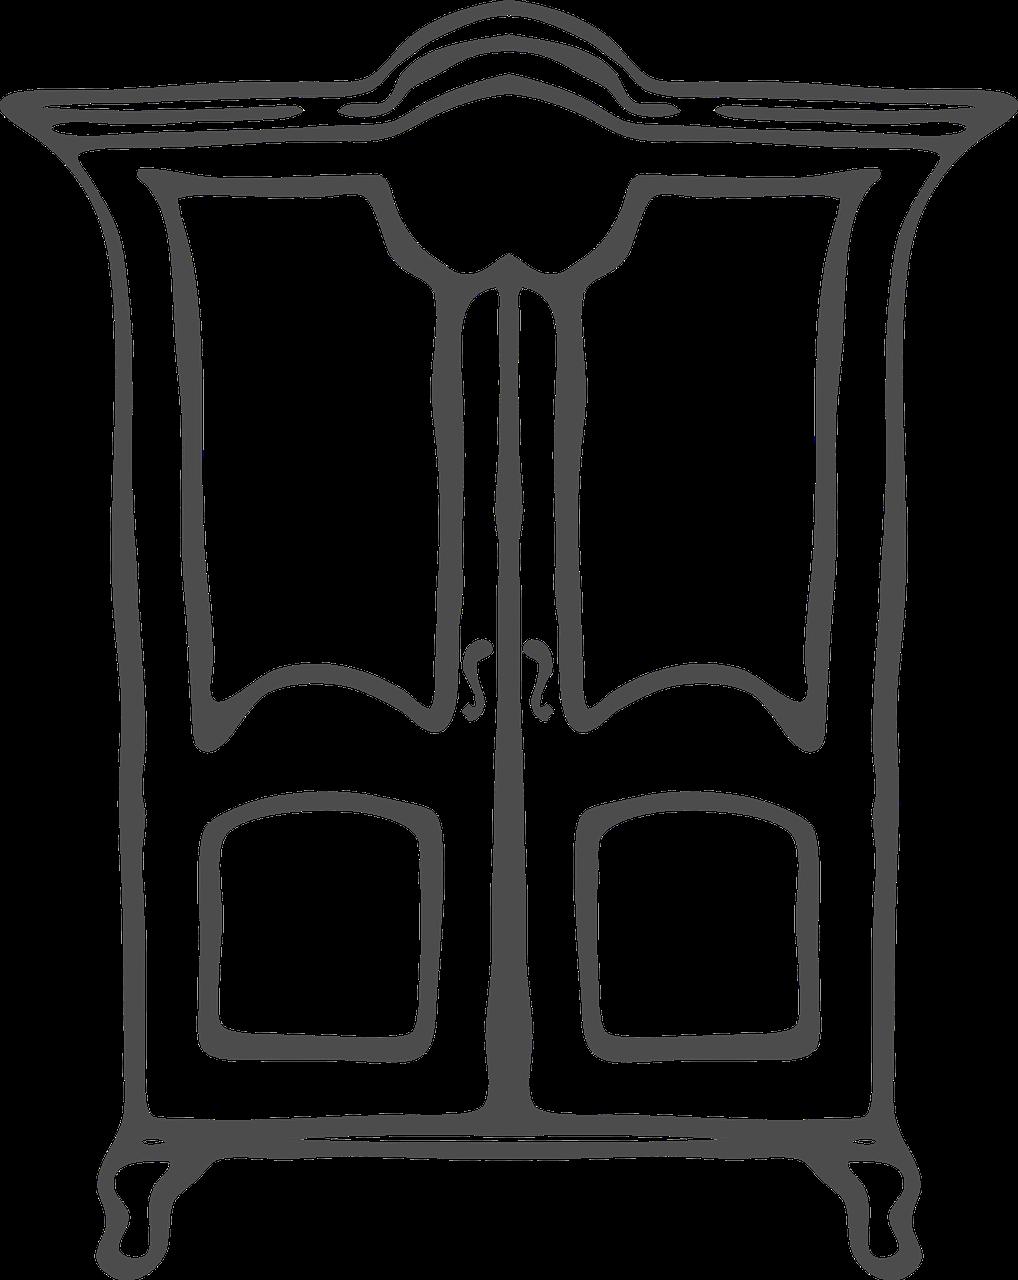 De kast is opgeruimd sterk in eigen kracht coaching - Chaise en plastique transparent ...